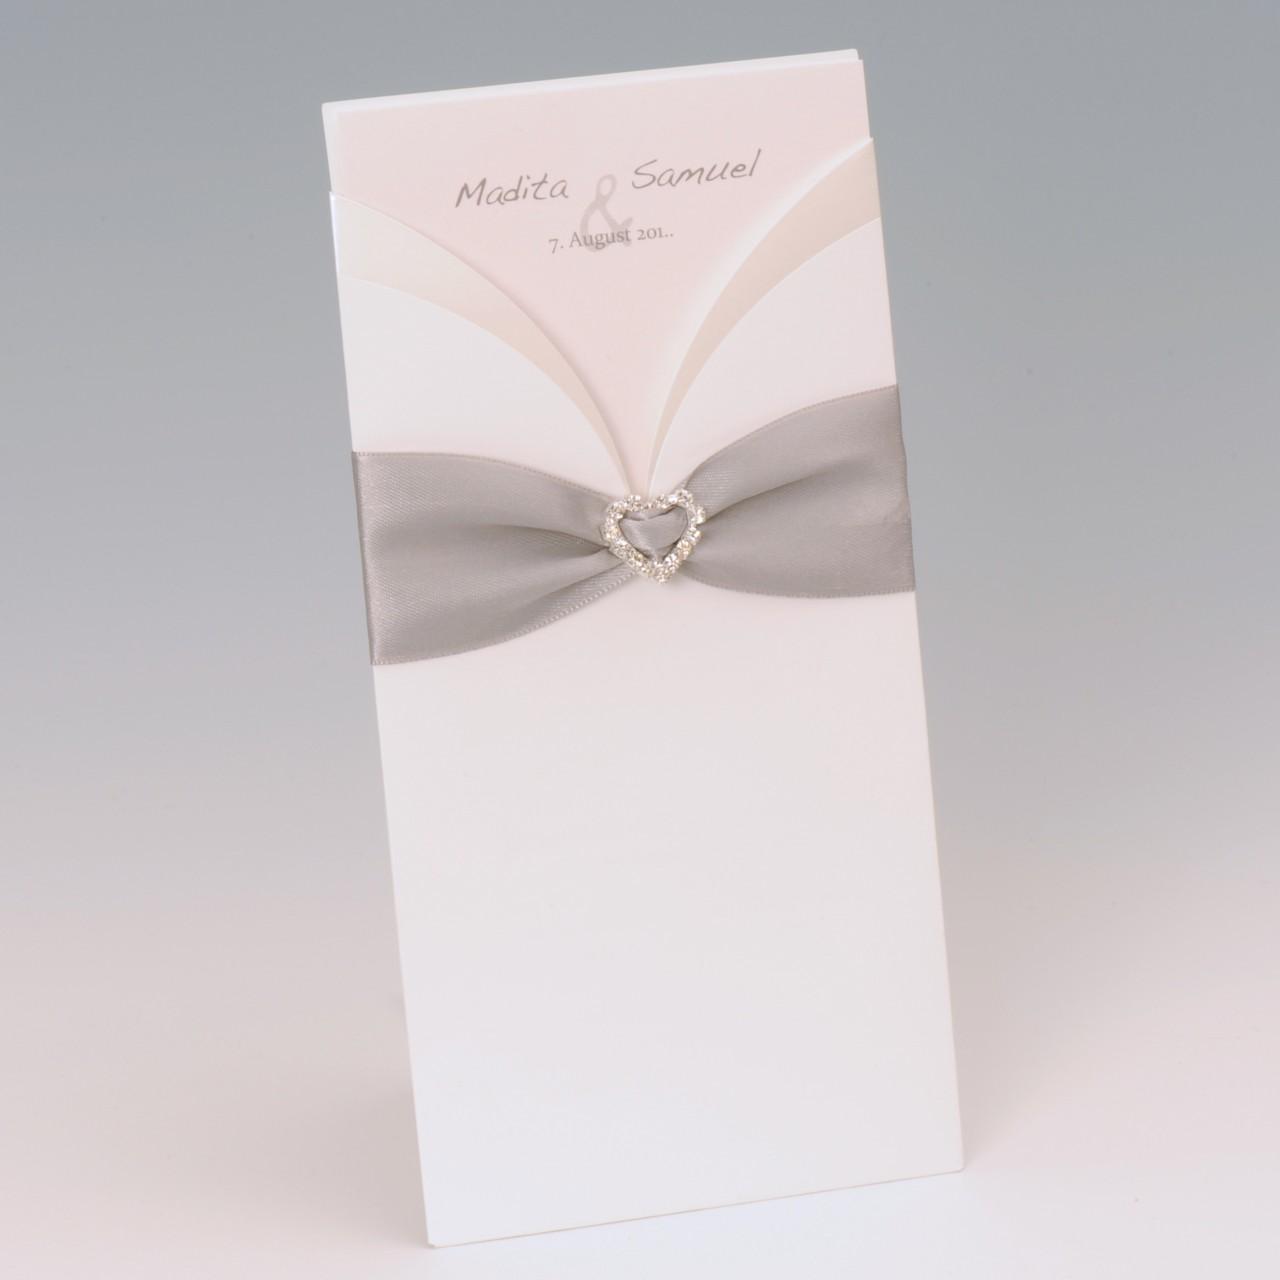 Einladungskarte - H 1993